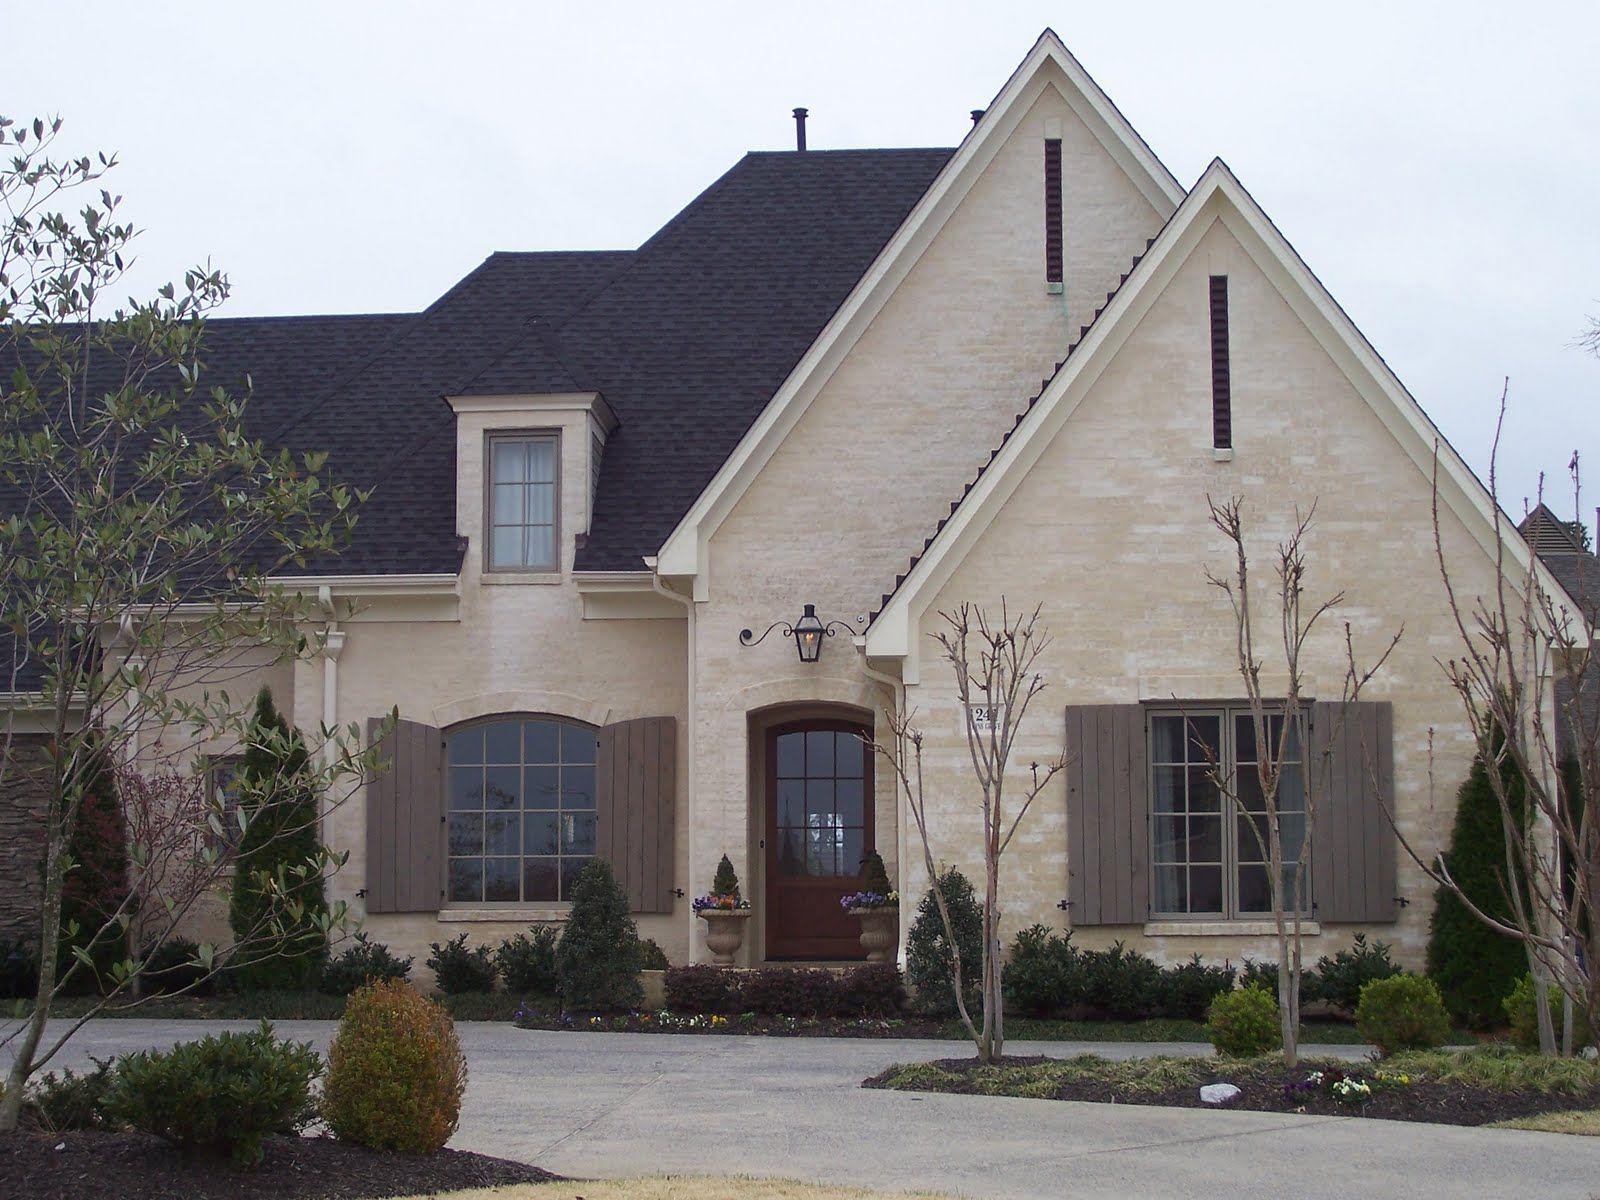 Superb 17 Best Ideas About Brick House Exteriors On Pinterest Brick Largest Home Design Picture Inspirations Pitcheantrous